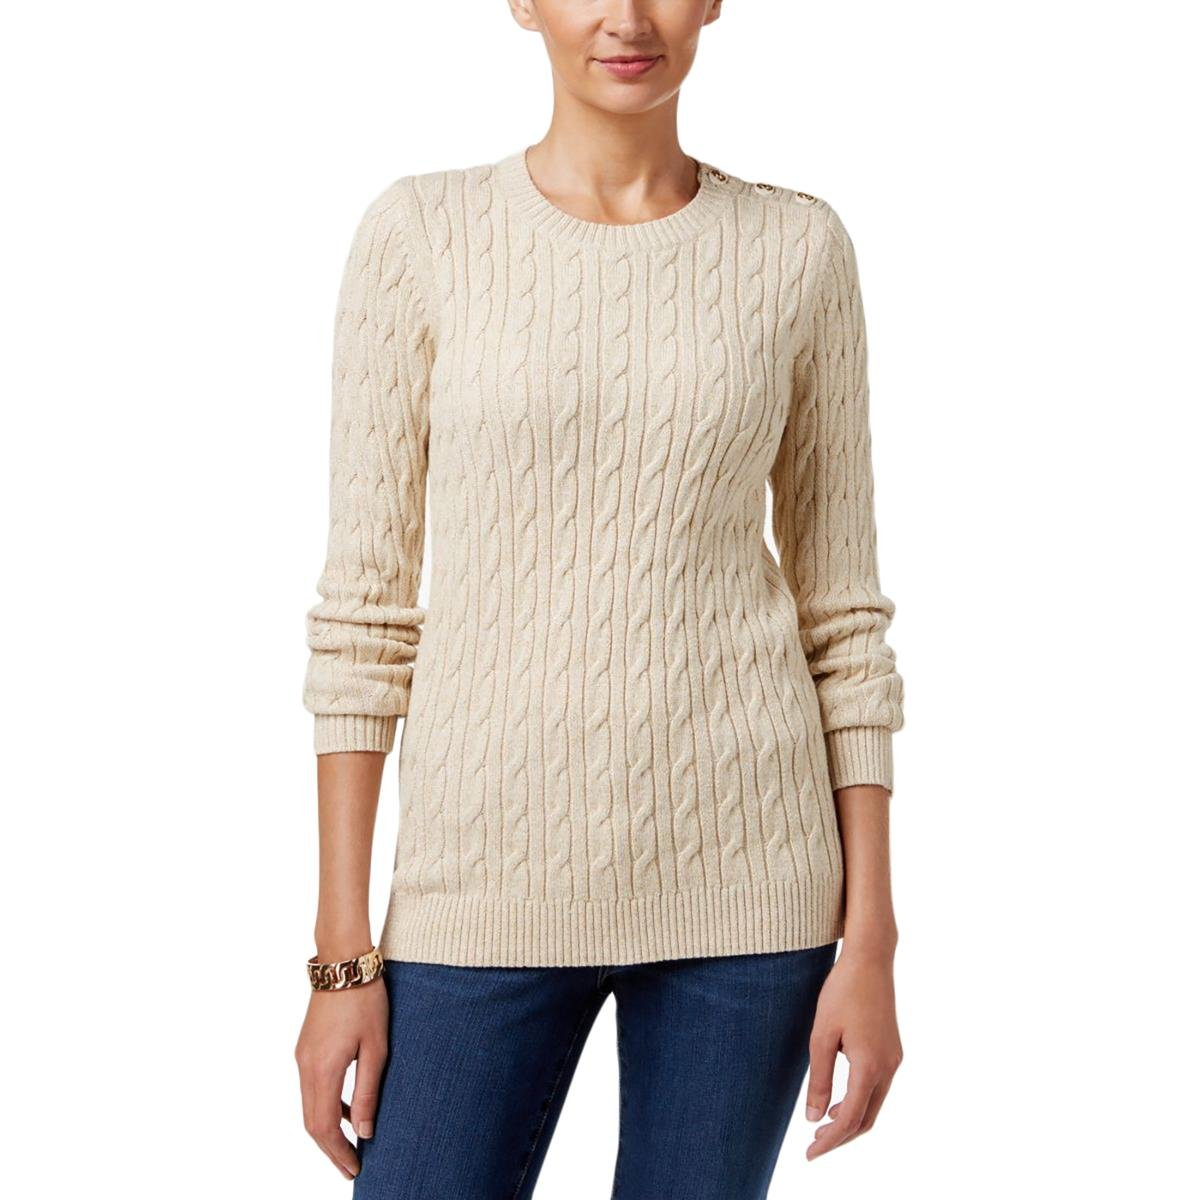 Charter Club Womens Cable Knit Metallic Crewneck Sweater Beige XXL